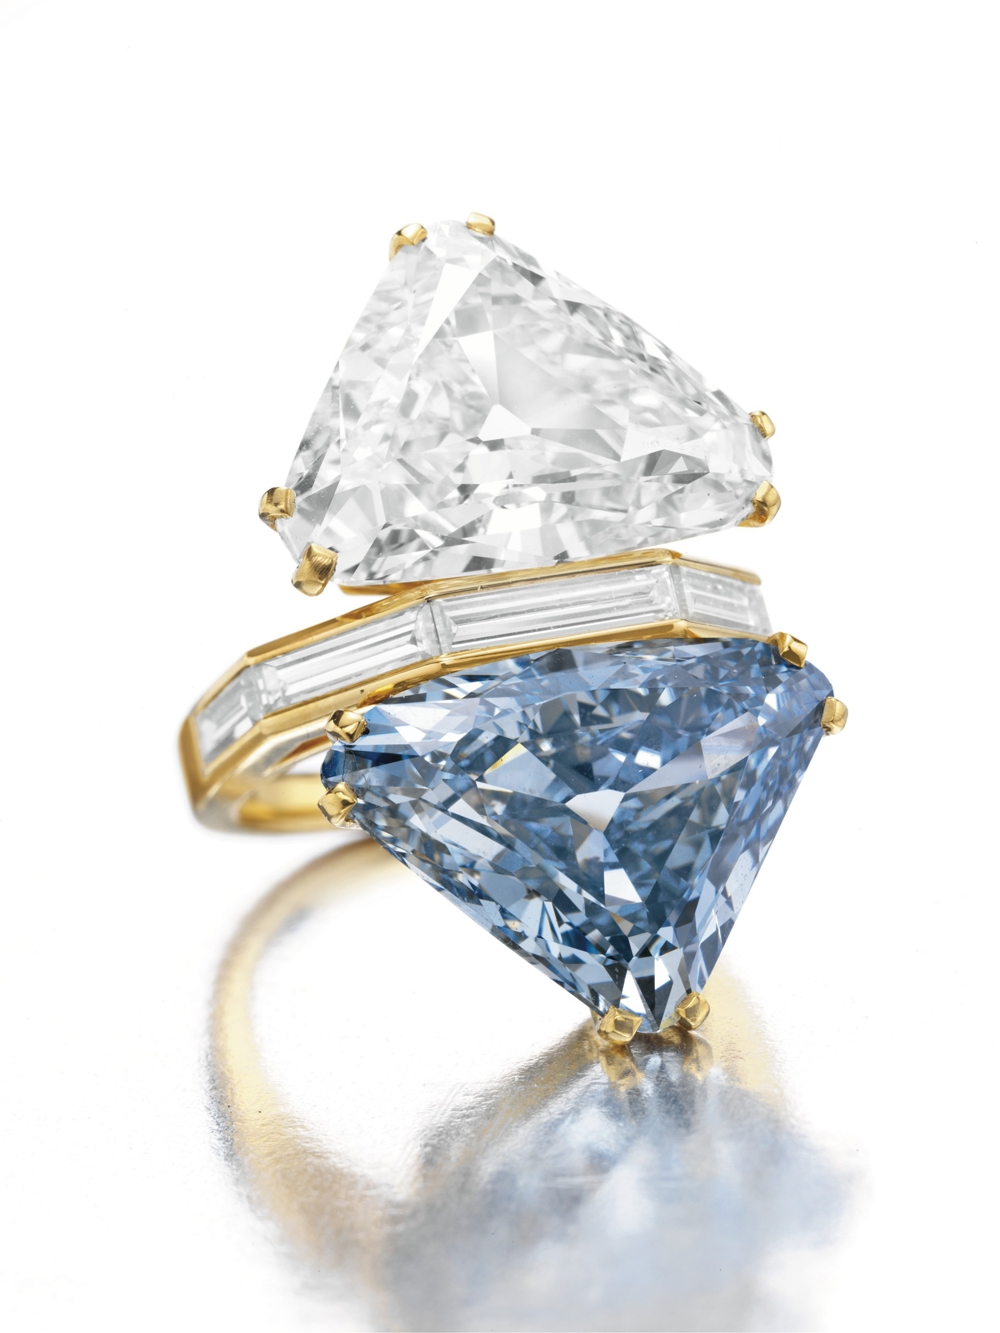 The Bulgari Blue Diamond Sold for Almost $15.8 Million